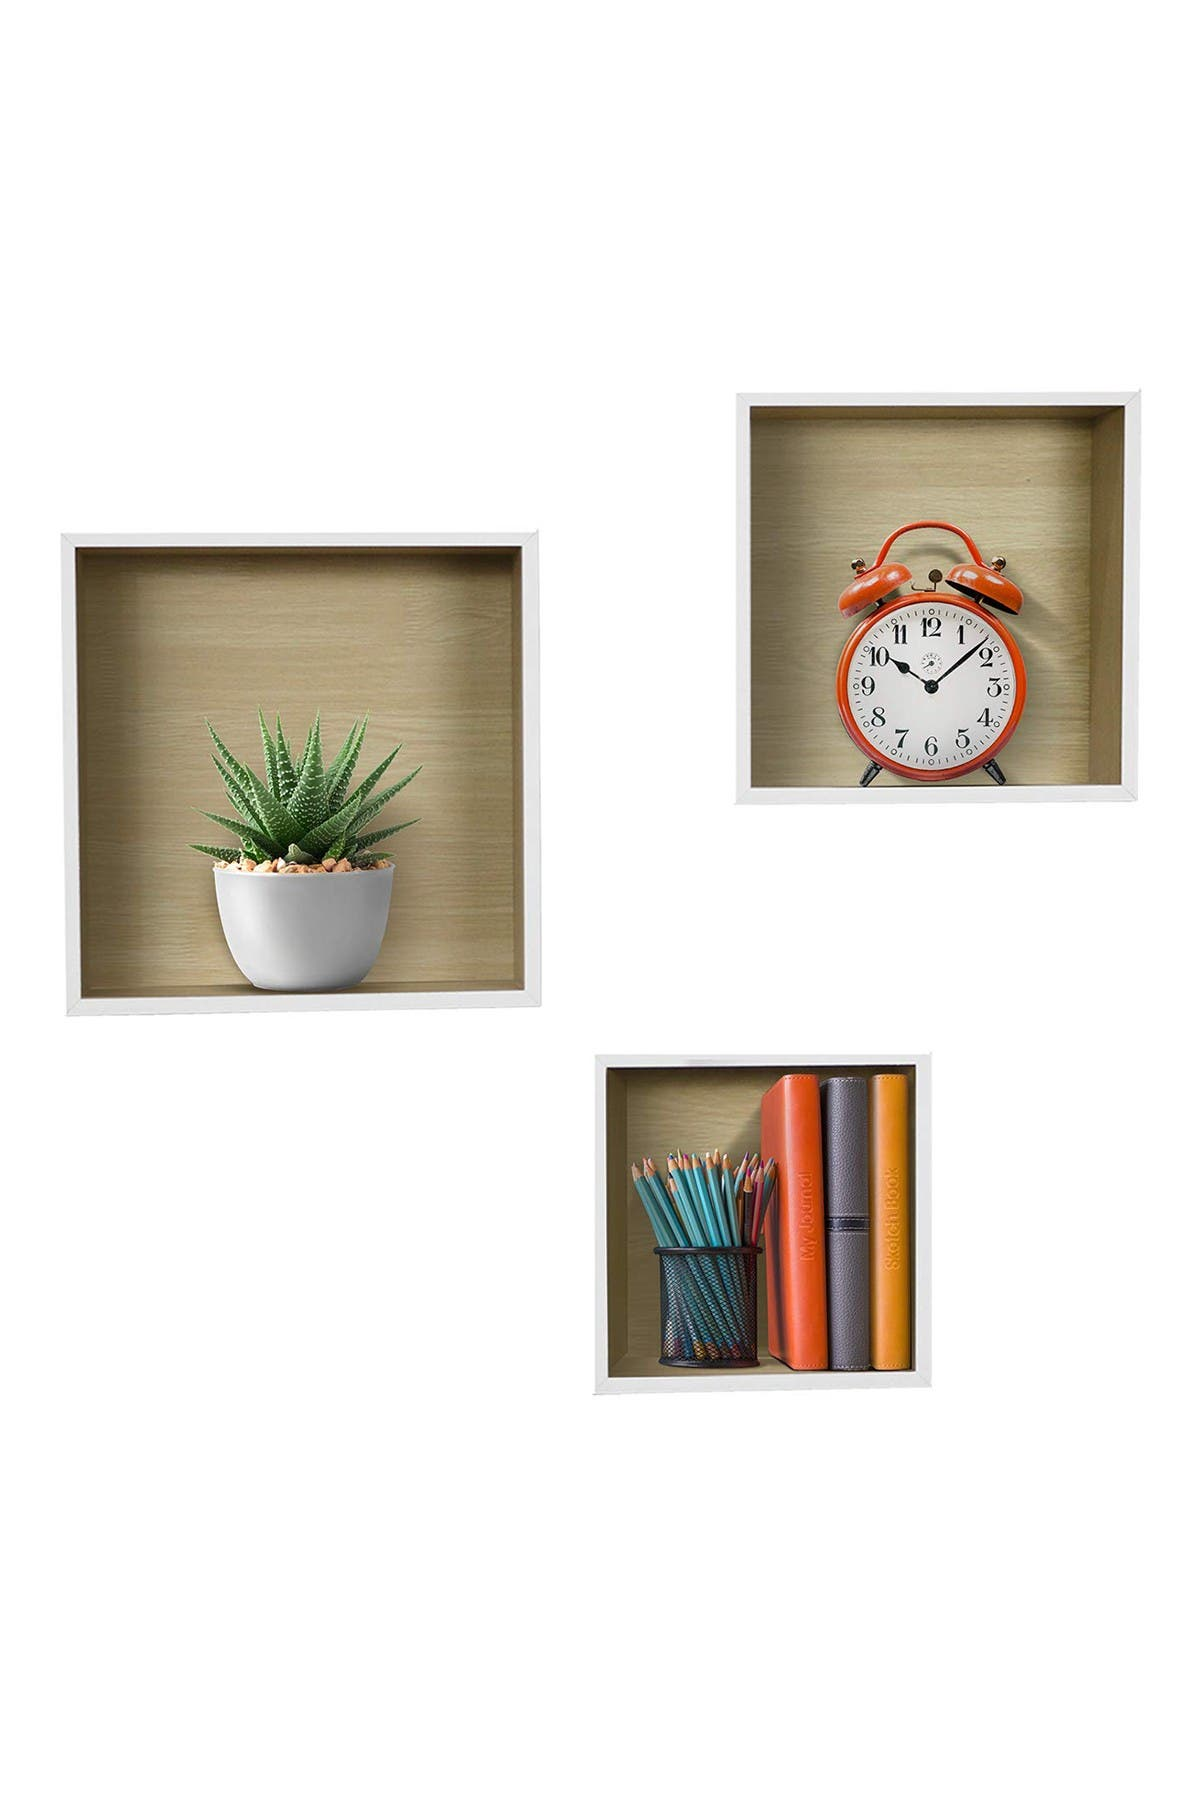 Image of Sorbus Floating Wood Box Shelves - Set of 3 - White